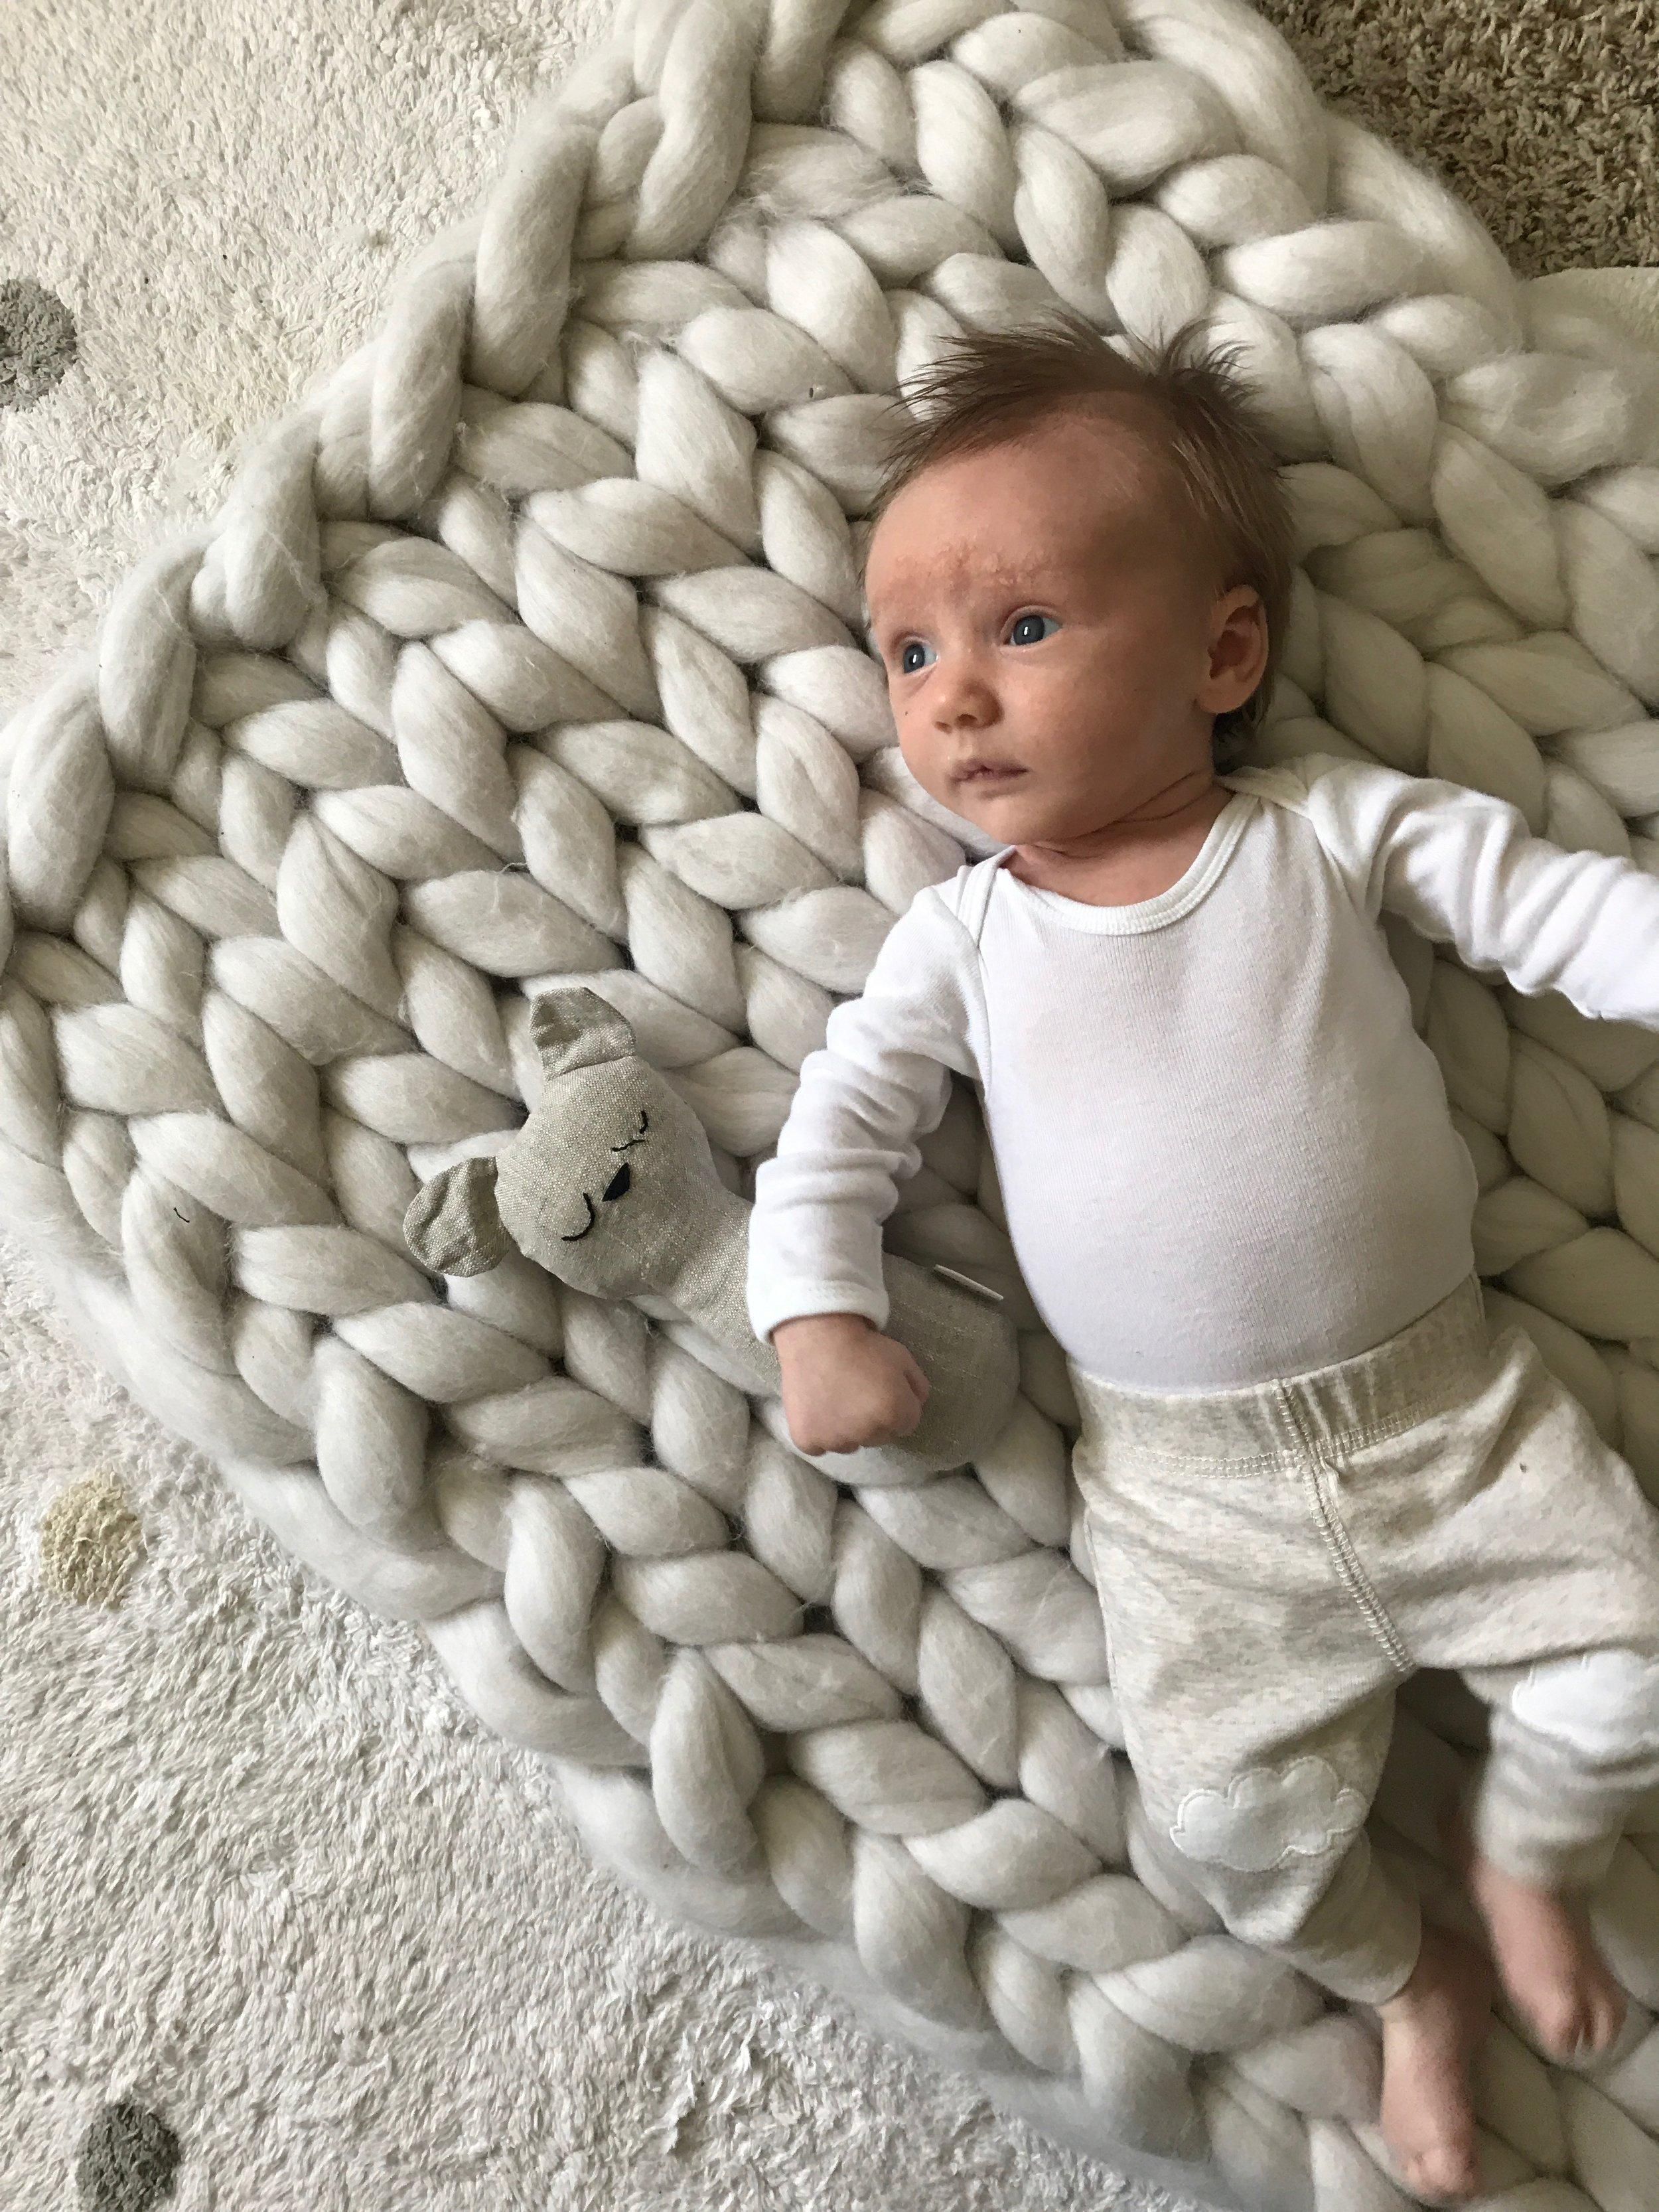 Woolly Cloud  Merino Wool Blanket II  Tuk + Milo  Rattle